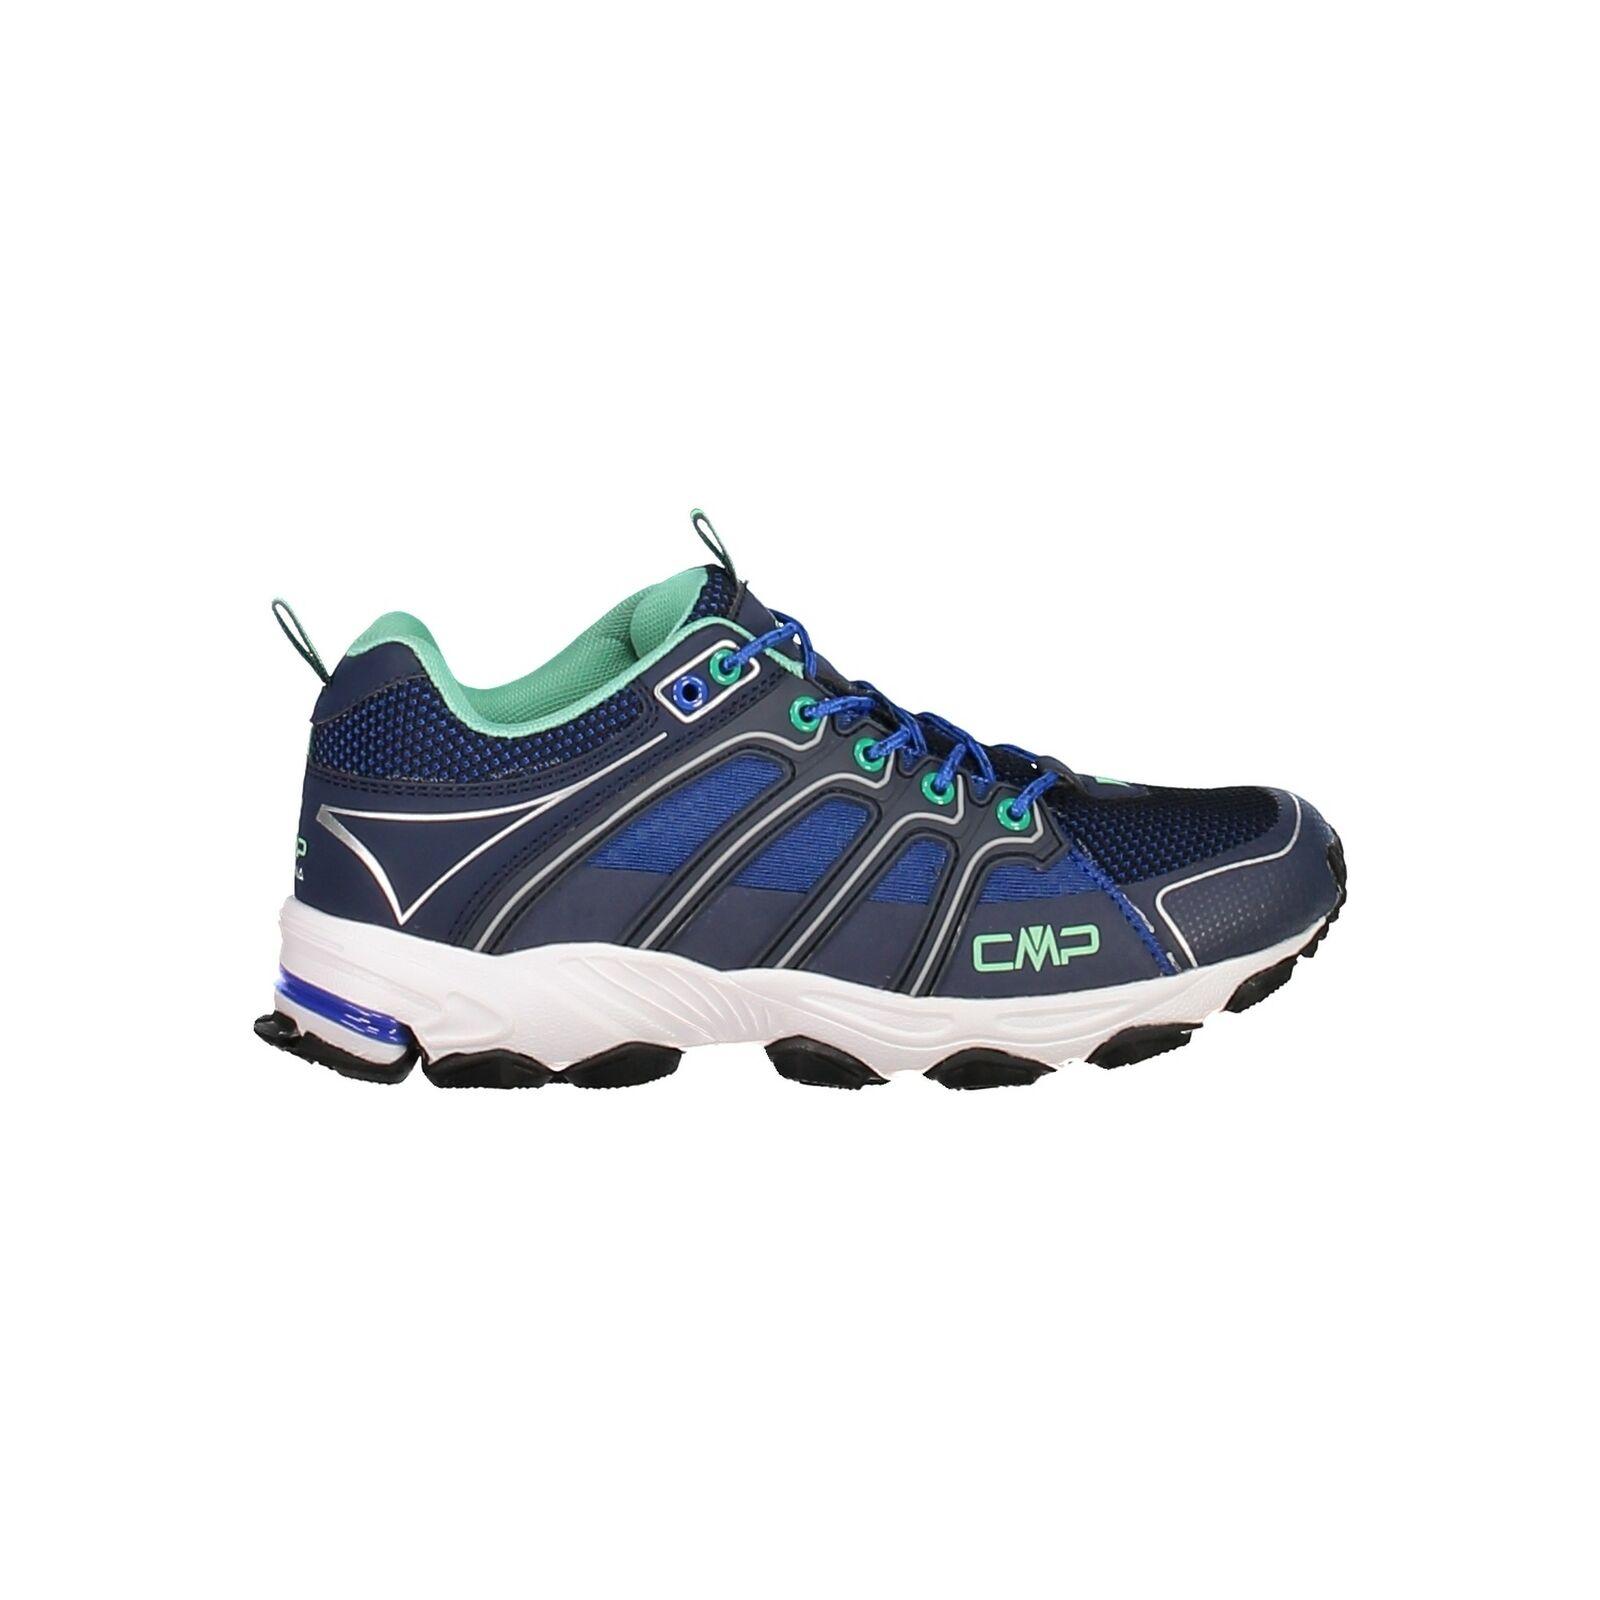 CMP Running Sports shoes Agena Wmn Trail shoes Grey Light Plain Colour Mesh